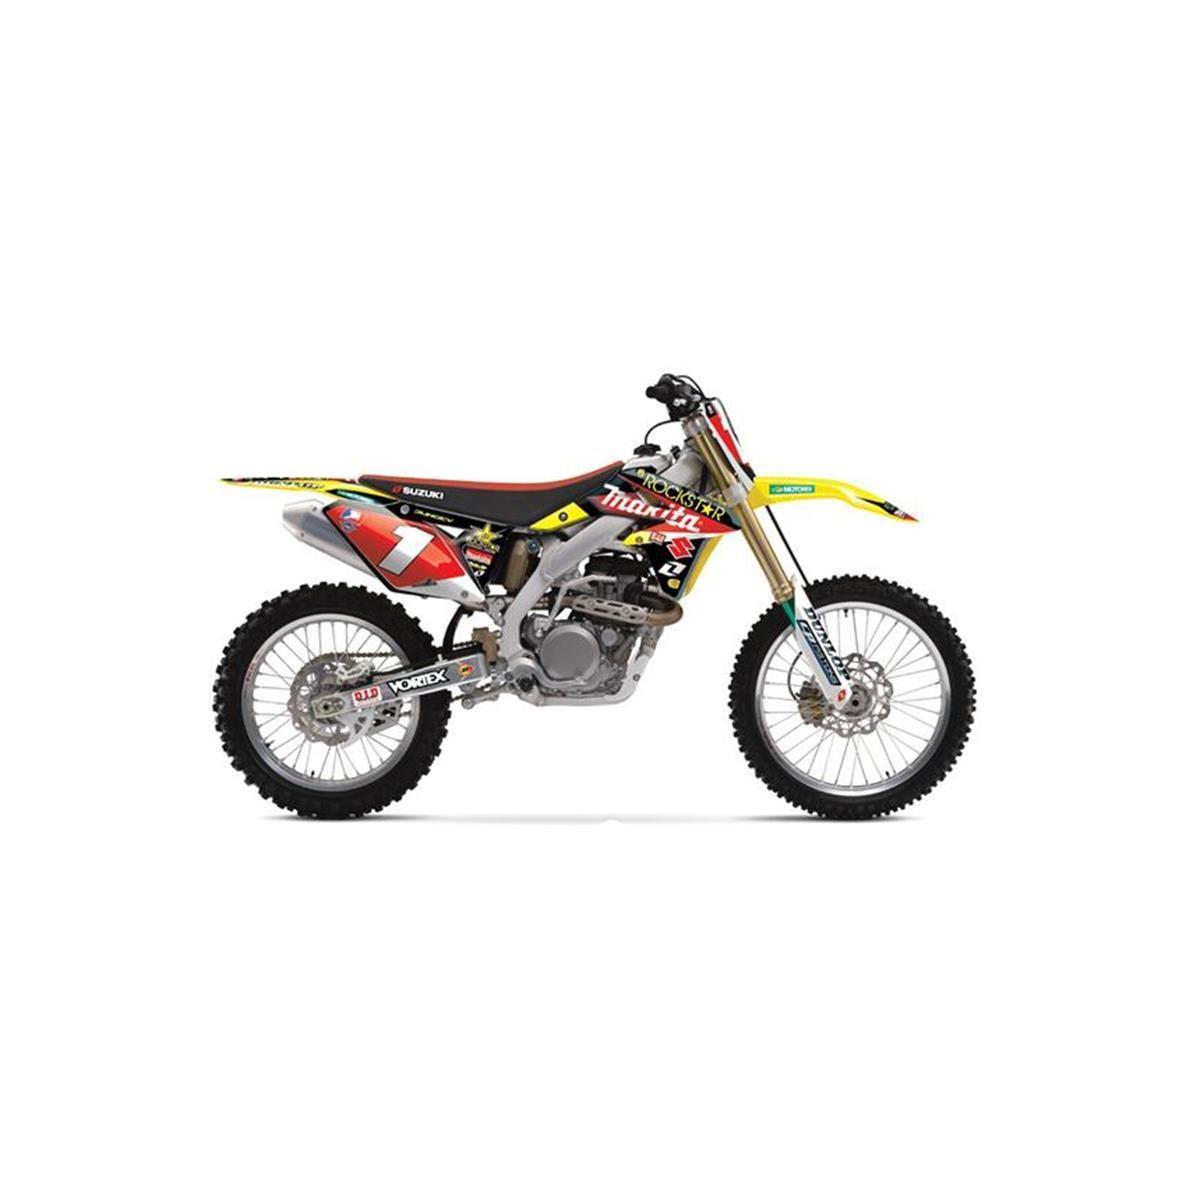 airbrush aufkleber yellow air motocross die cut stickers. Black Bedroom Furniture Sets. Home Design Ideas